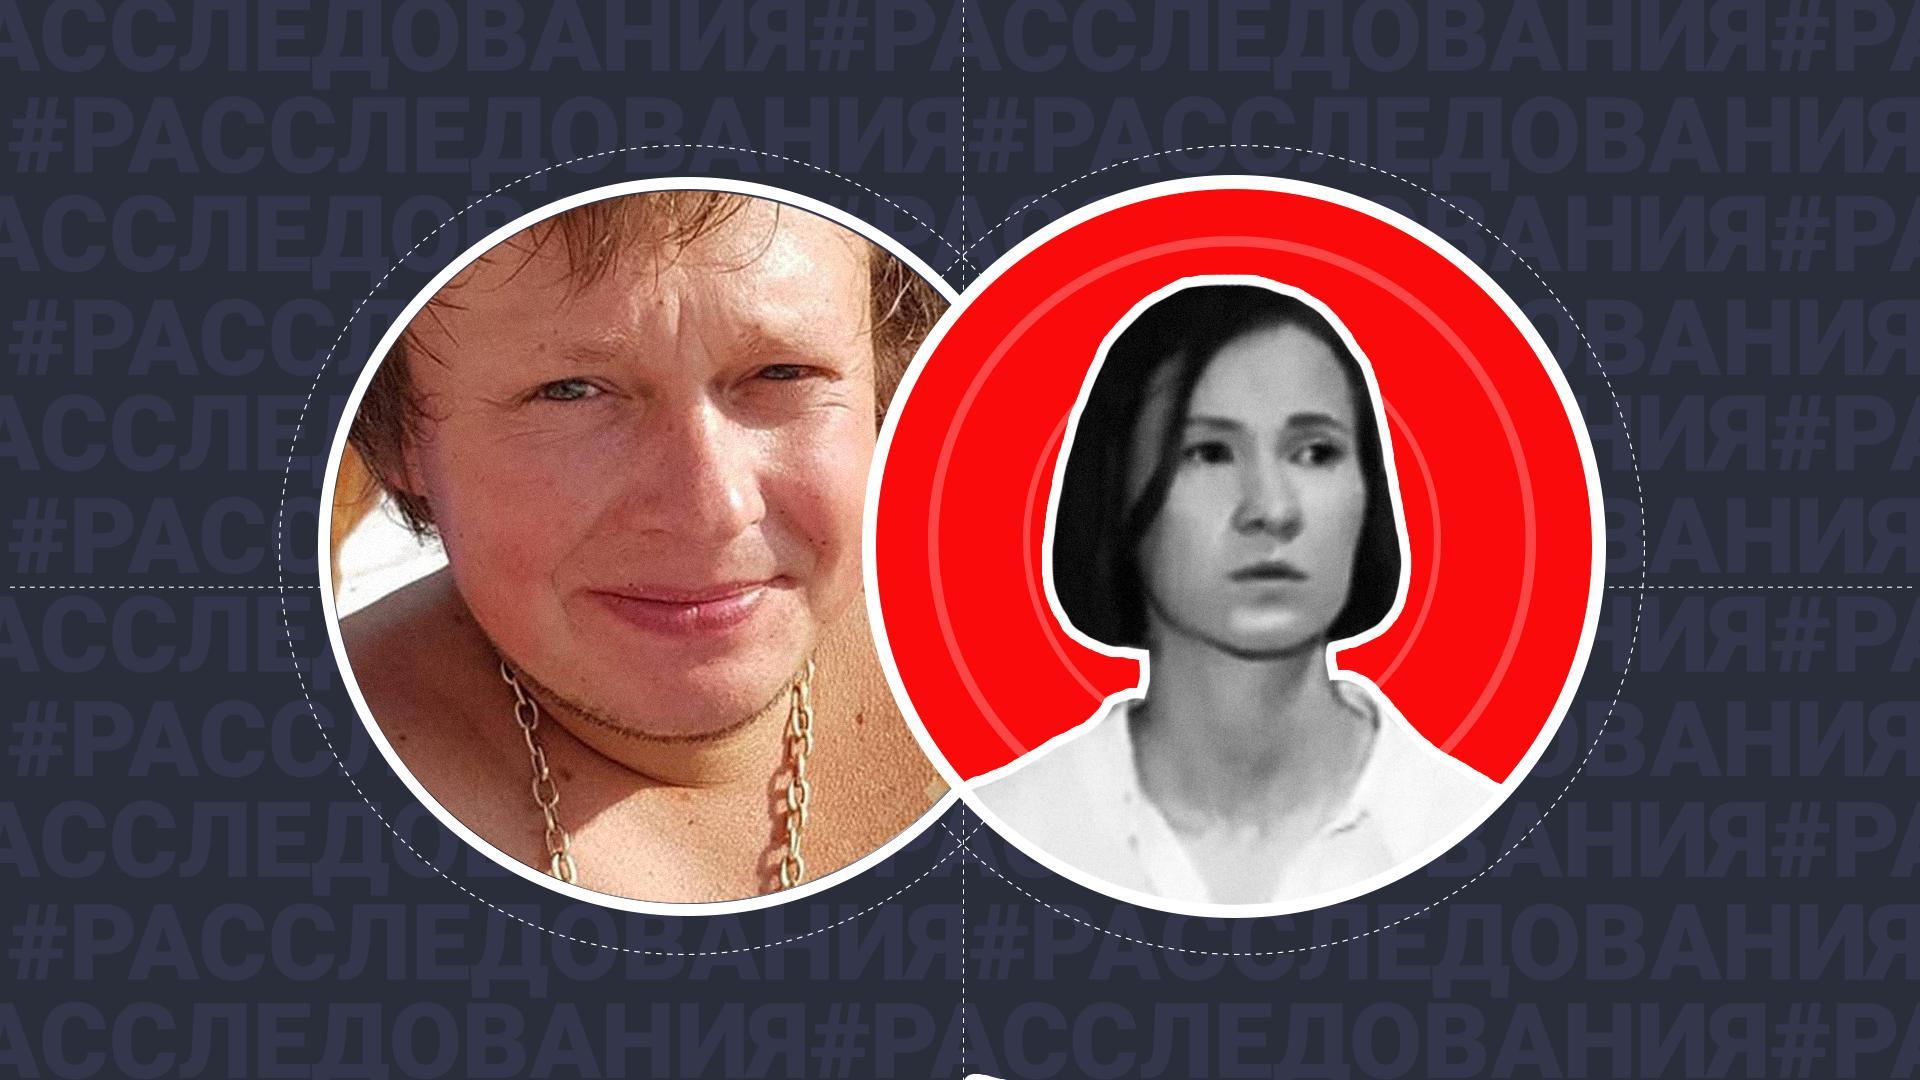 "<p>Фото © Скриншот из видео <a href=""https://www.youtube.com/watch?v=PSQogTXVCGQ"" target=""_blank"" rel=""noopener noreferrer"">YouTube / Игорь Володин</a>, <a href=""https://www.youtube.com/watch?v=7GPrvAC-kHQ"" target=""_blank"" rel=""noopener noreferrer"">YouTube / Превью Премьер</a></p>"